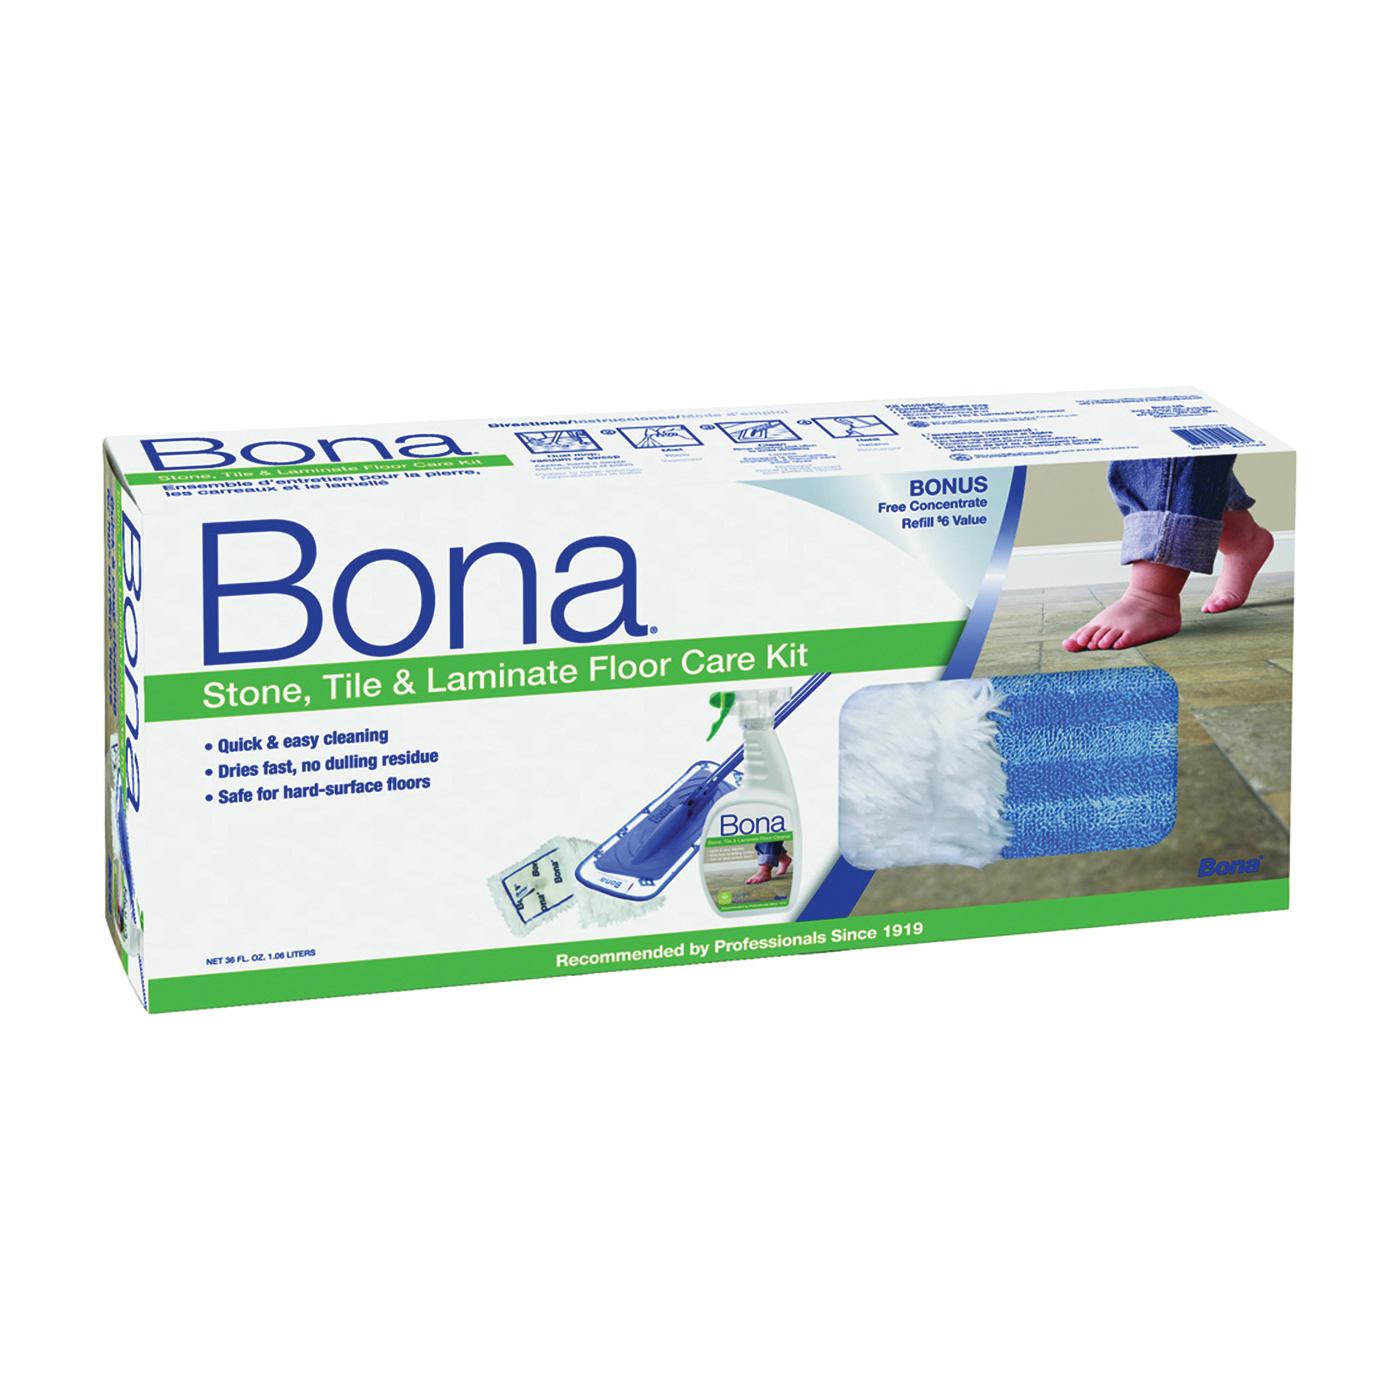 Bona WM710013385